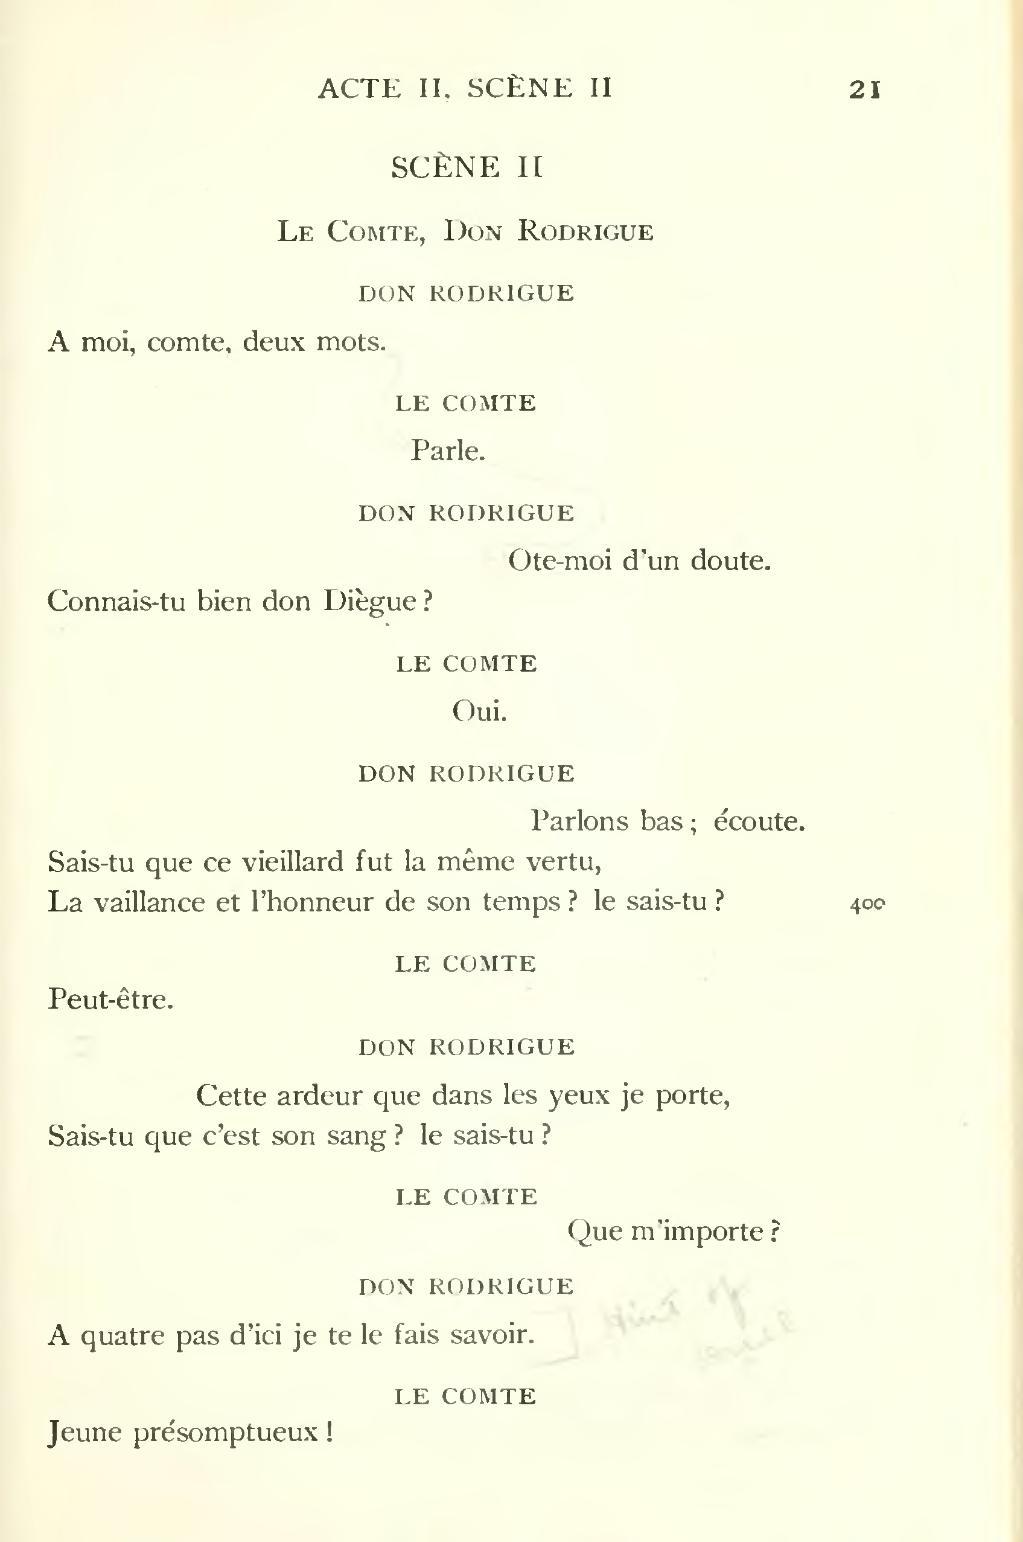 Le Cid Acte 2 Scene 2 : scene, Page:Corneille, Searles,, 1912.djvu/55, Wikisource